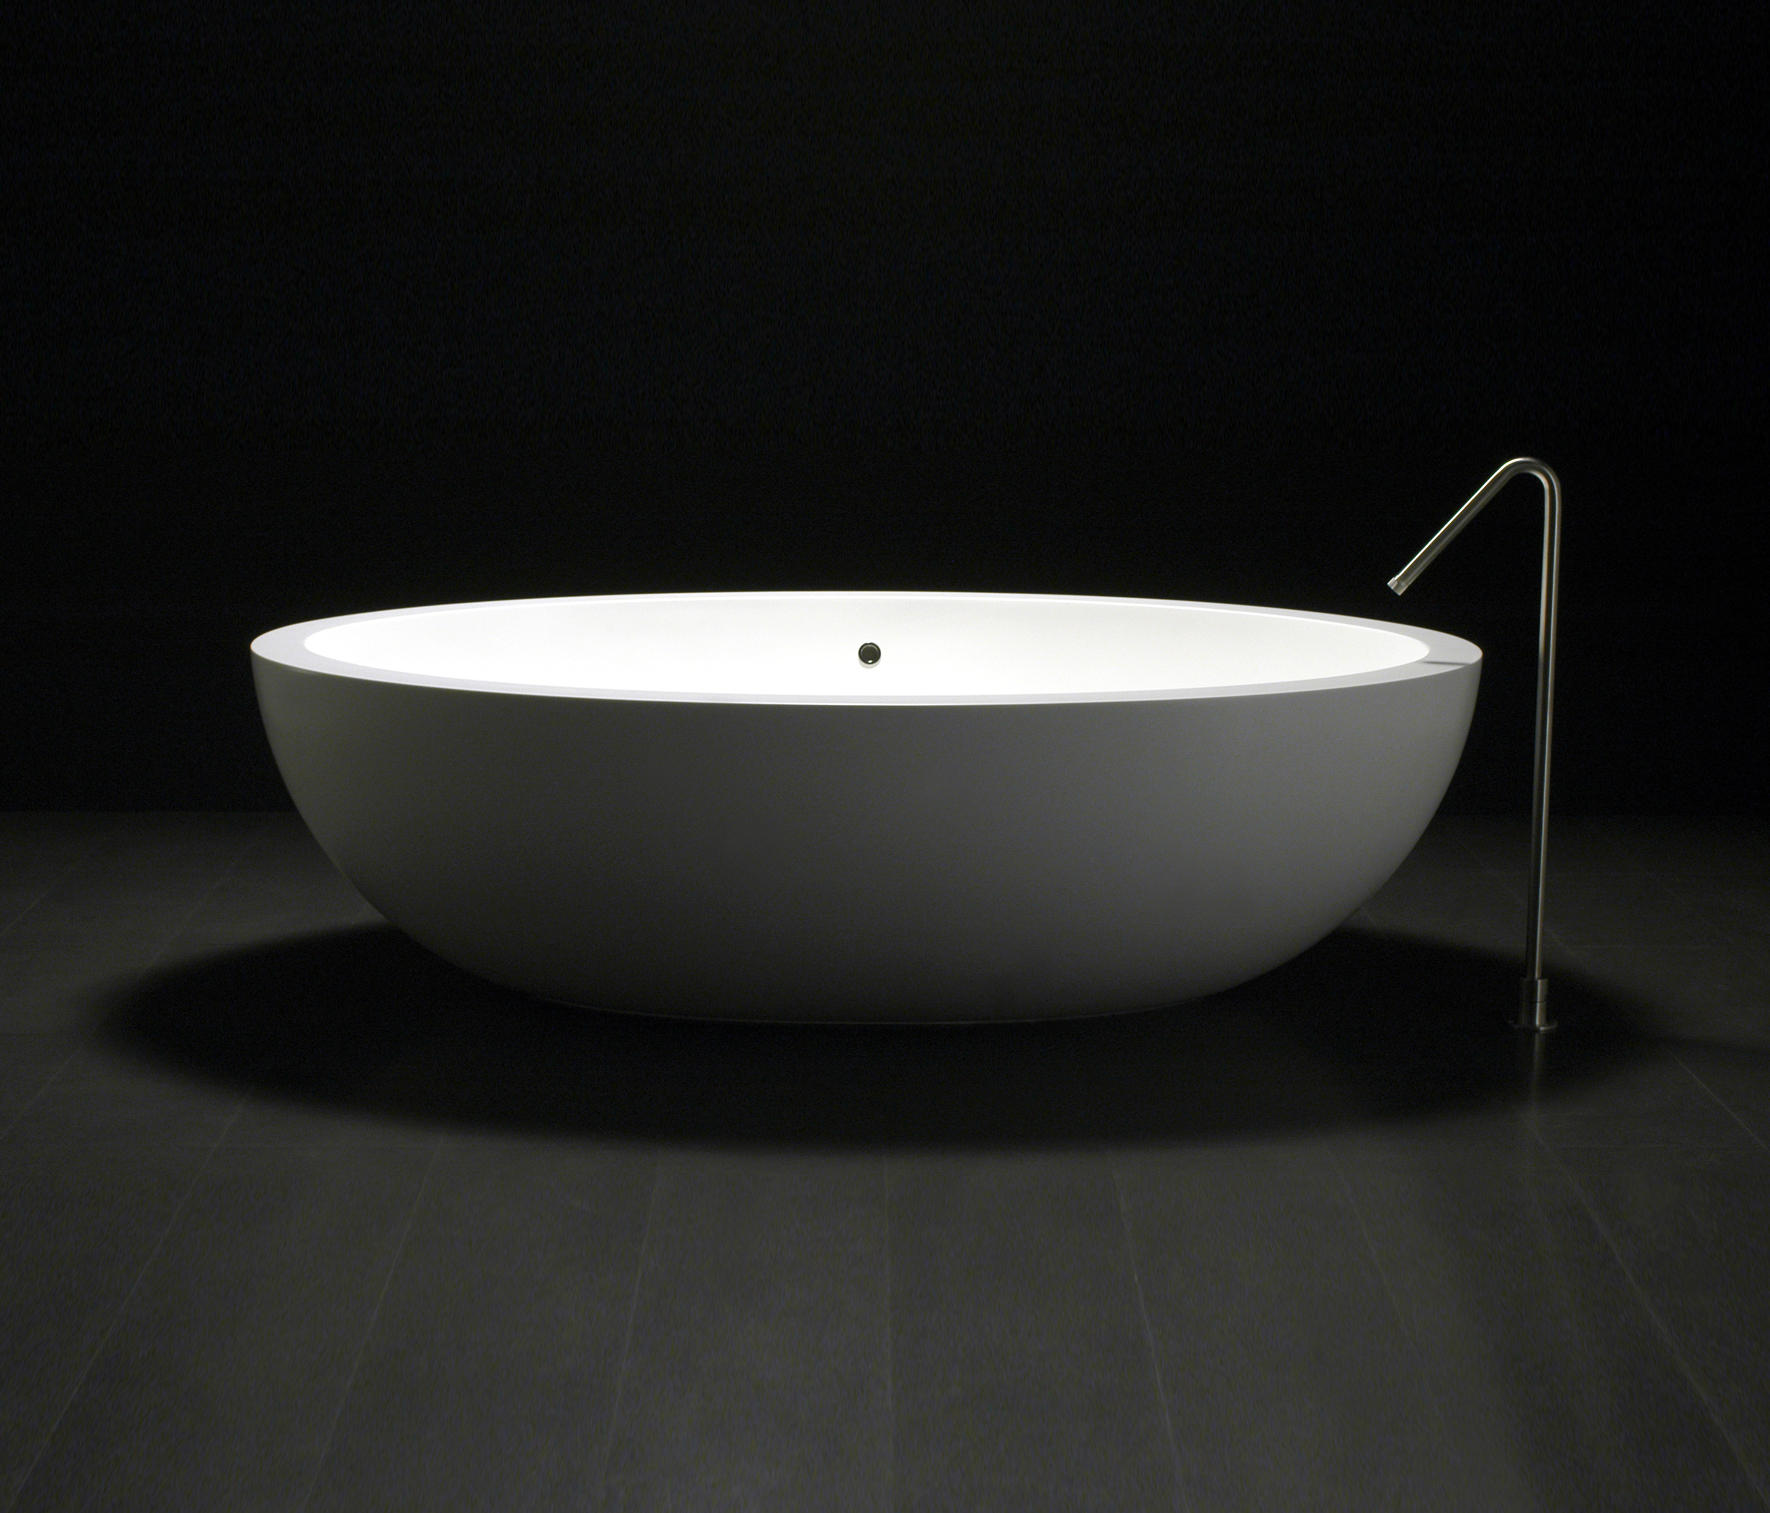 https://image.architonic.com/img_pro2-4/114/2886/bagni-vasche-Po-I-Fiumi-1-b.jpg